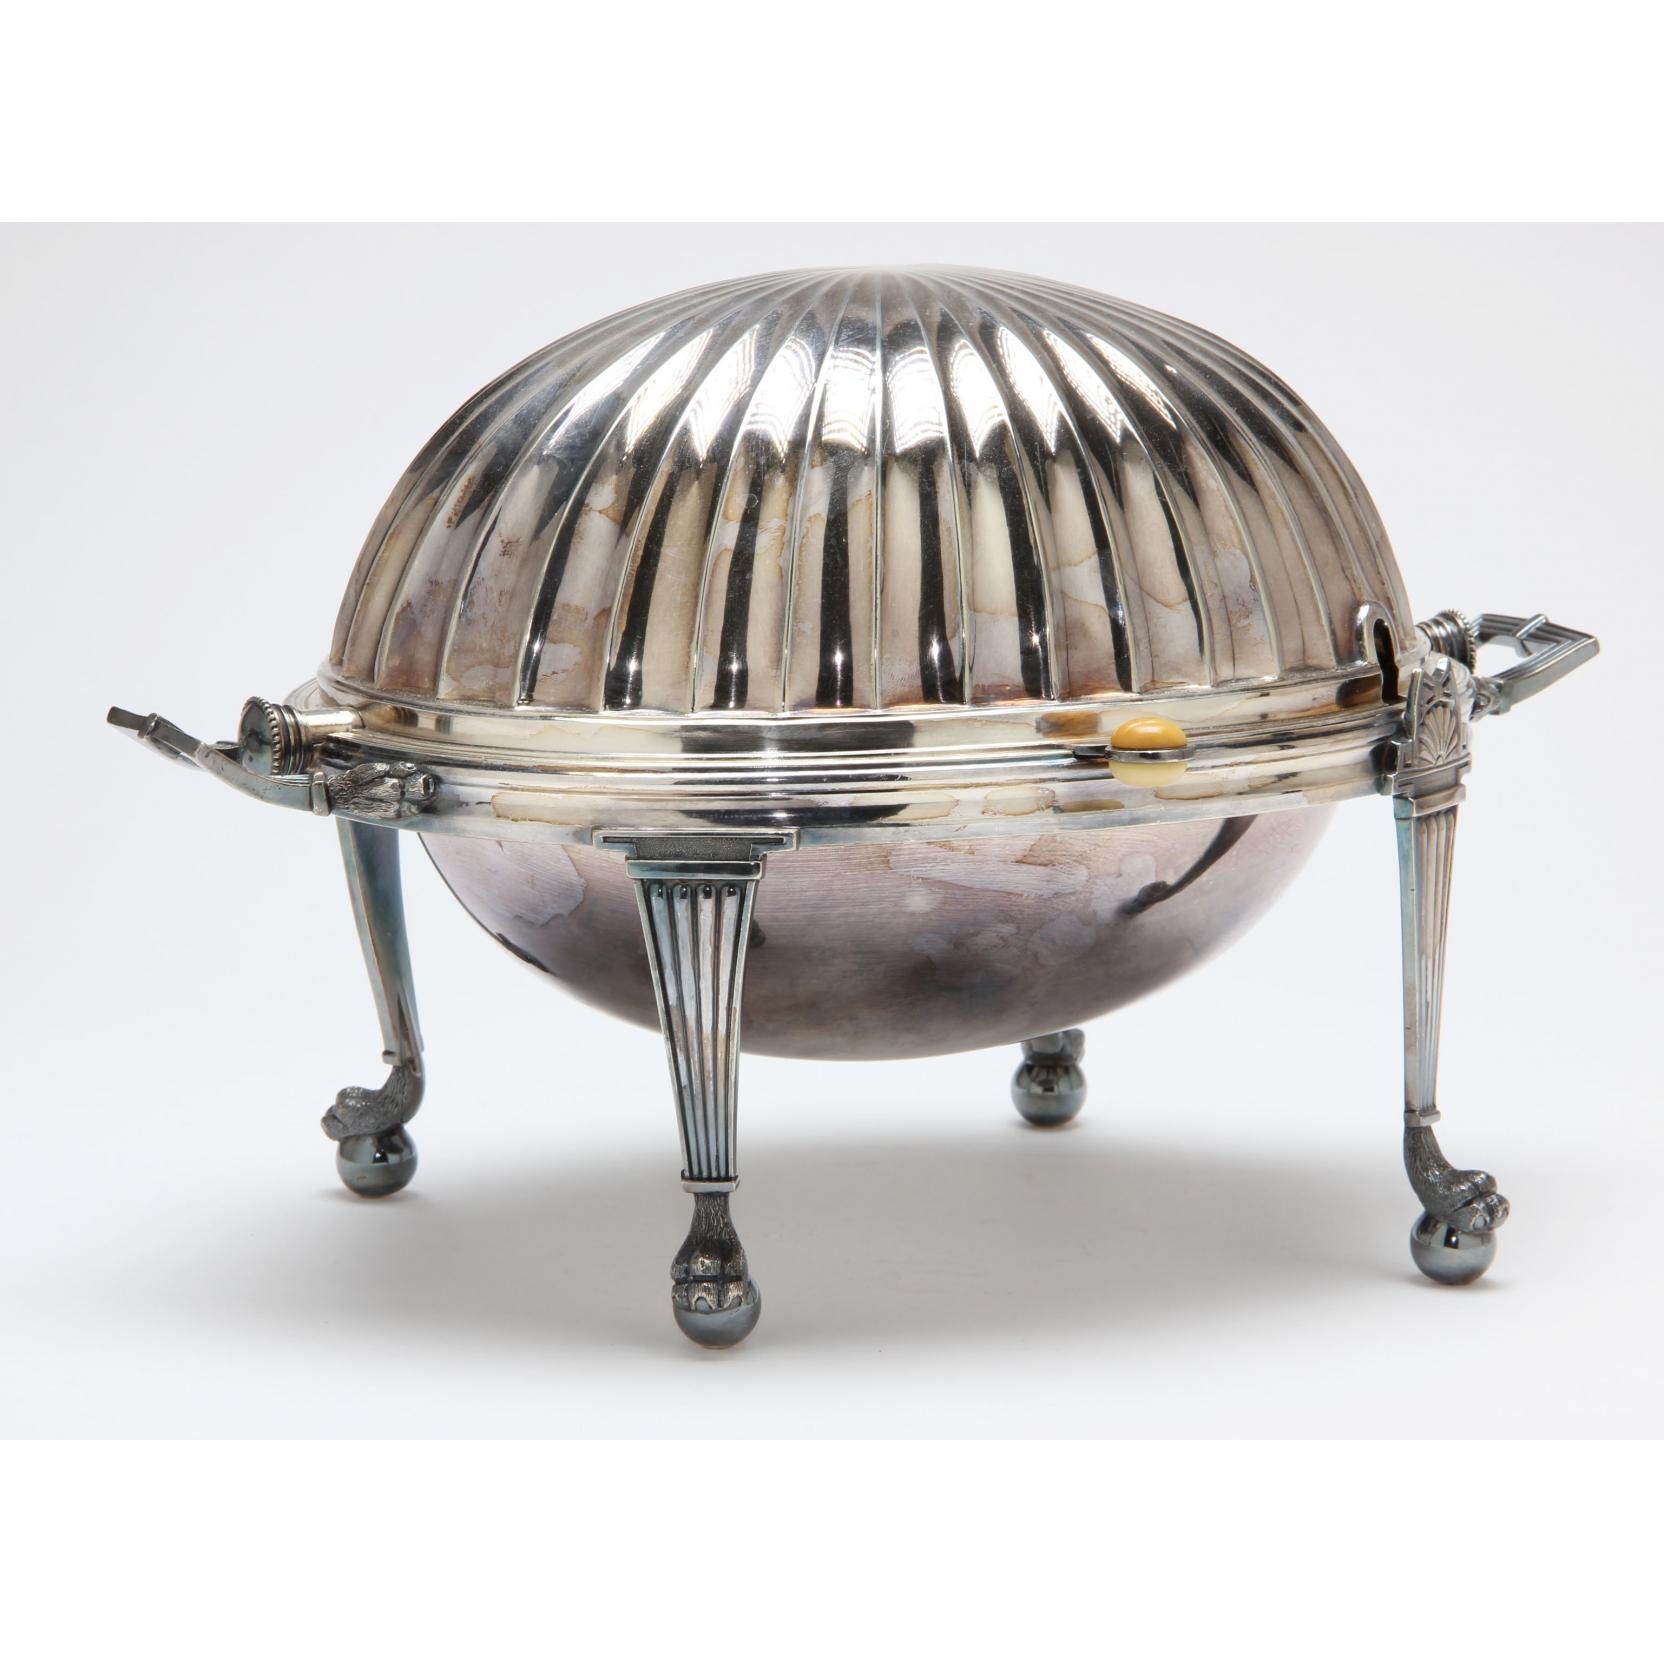 antique-english-silverplate-breakfast-server